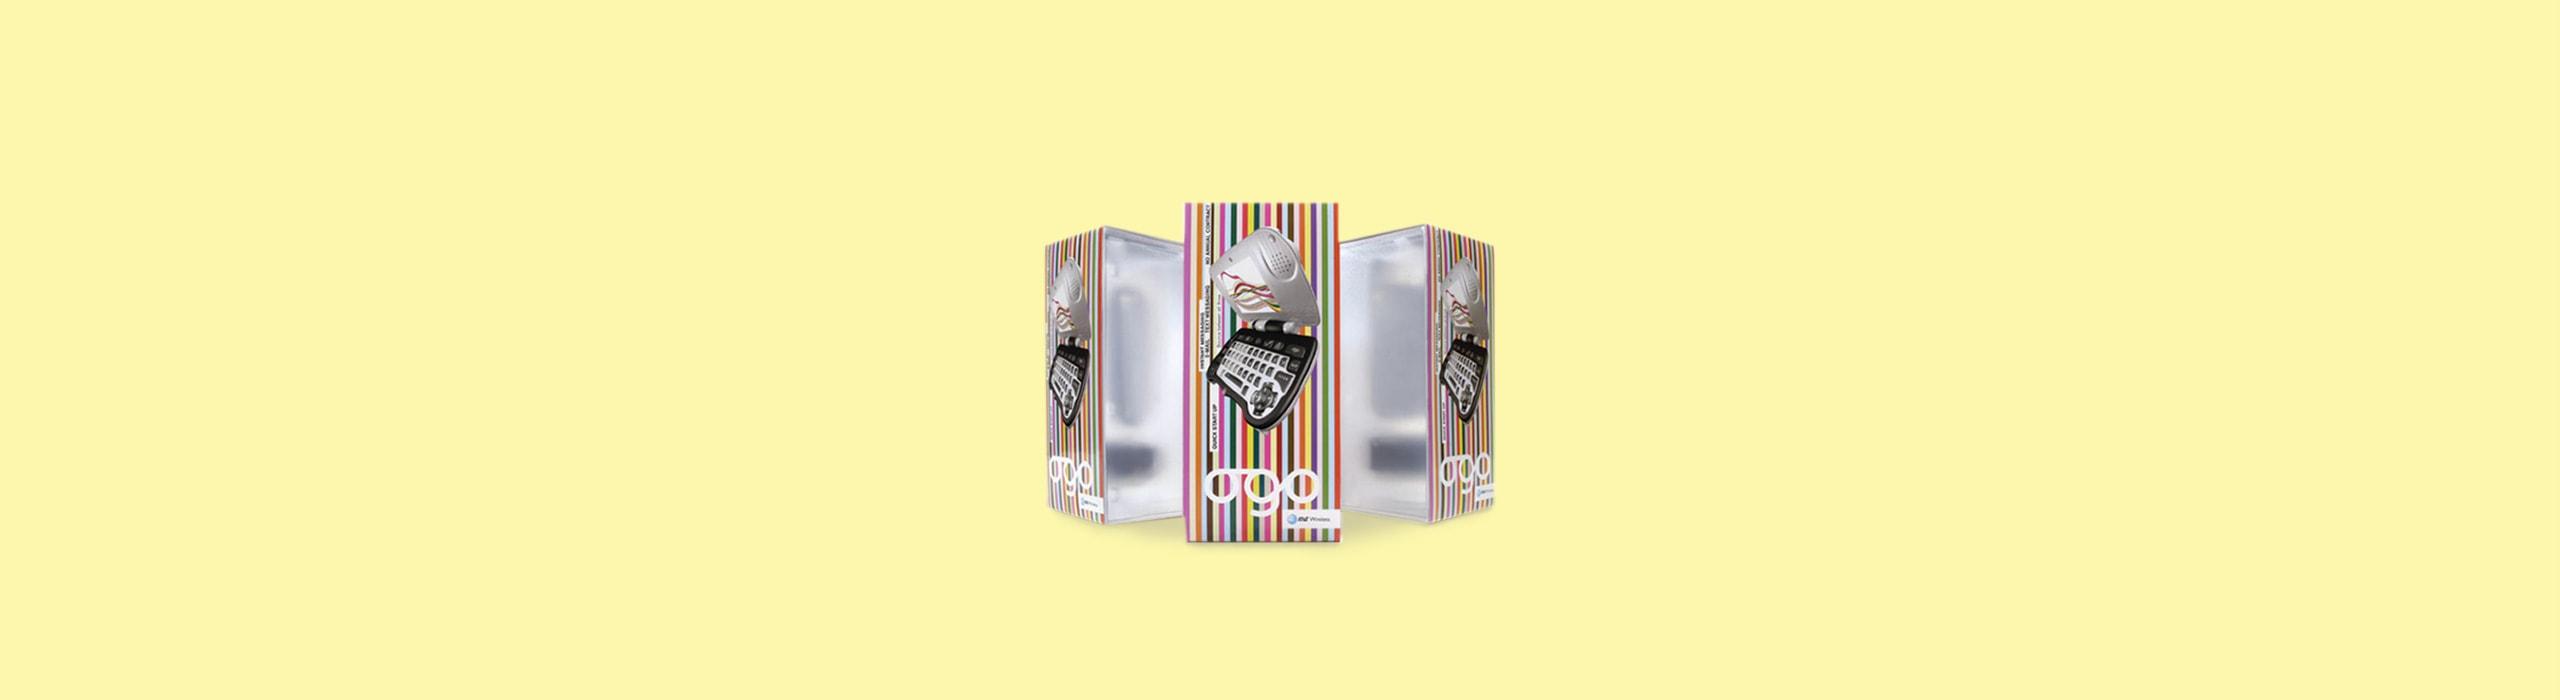 Ogo - natie-ogo-packaging - Natie Branding Agency